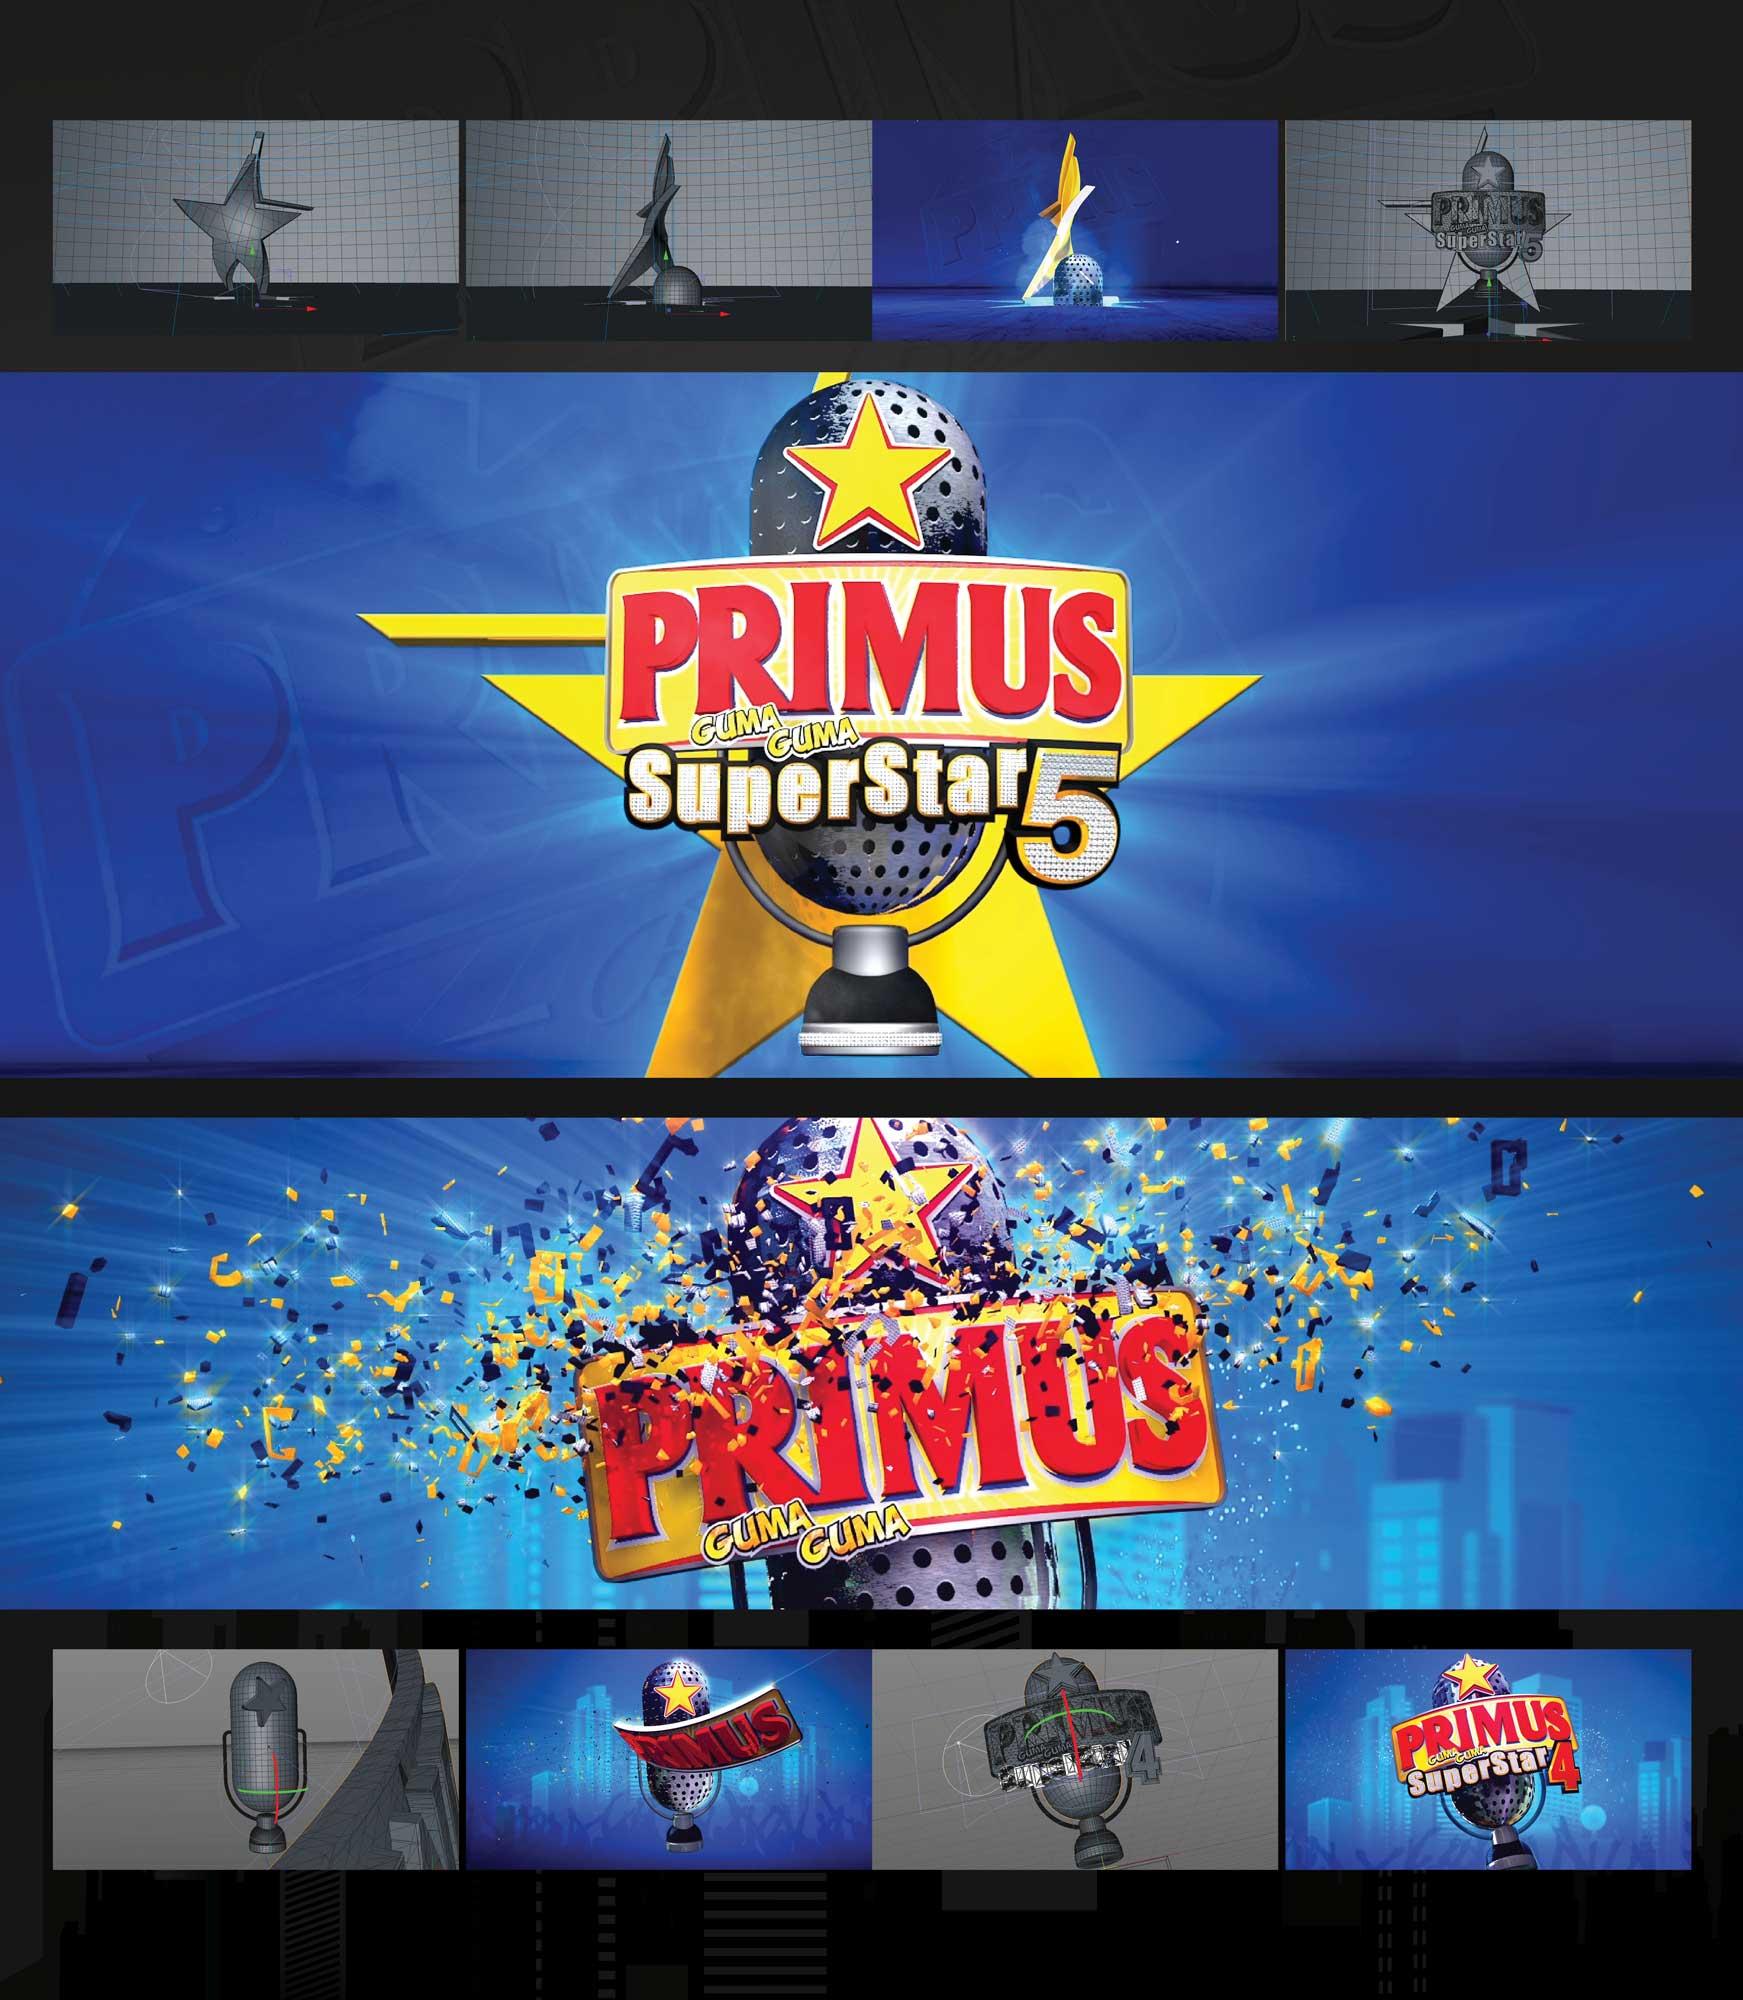 Primus Guma Guma Superstar 5